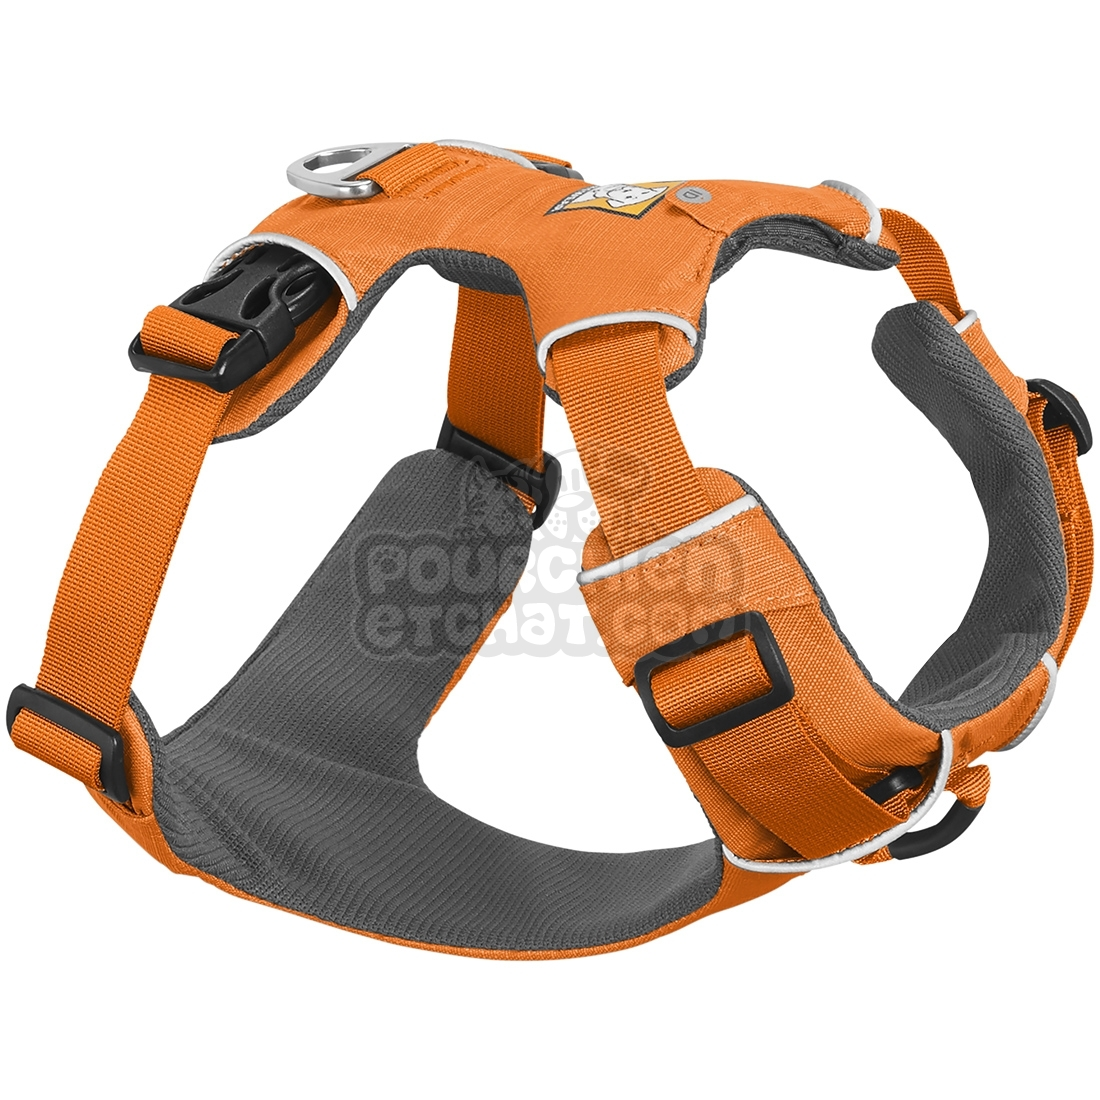 Harnais pour chien Ruffwear Front Range orange